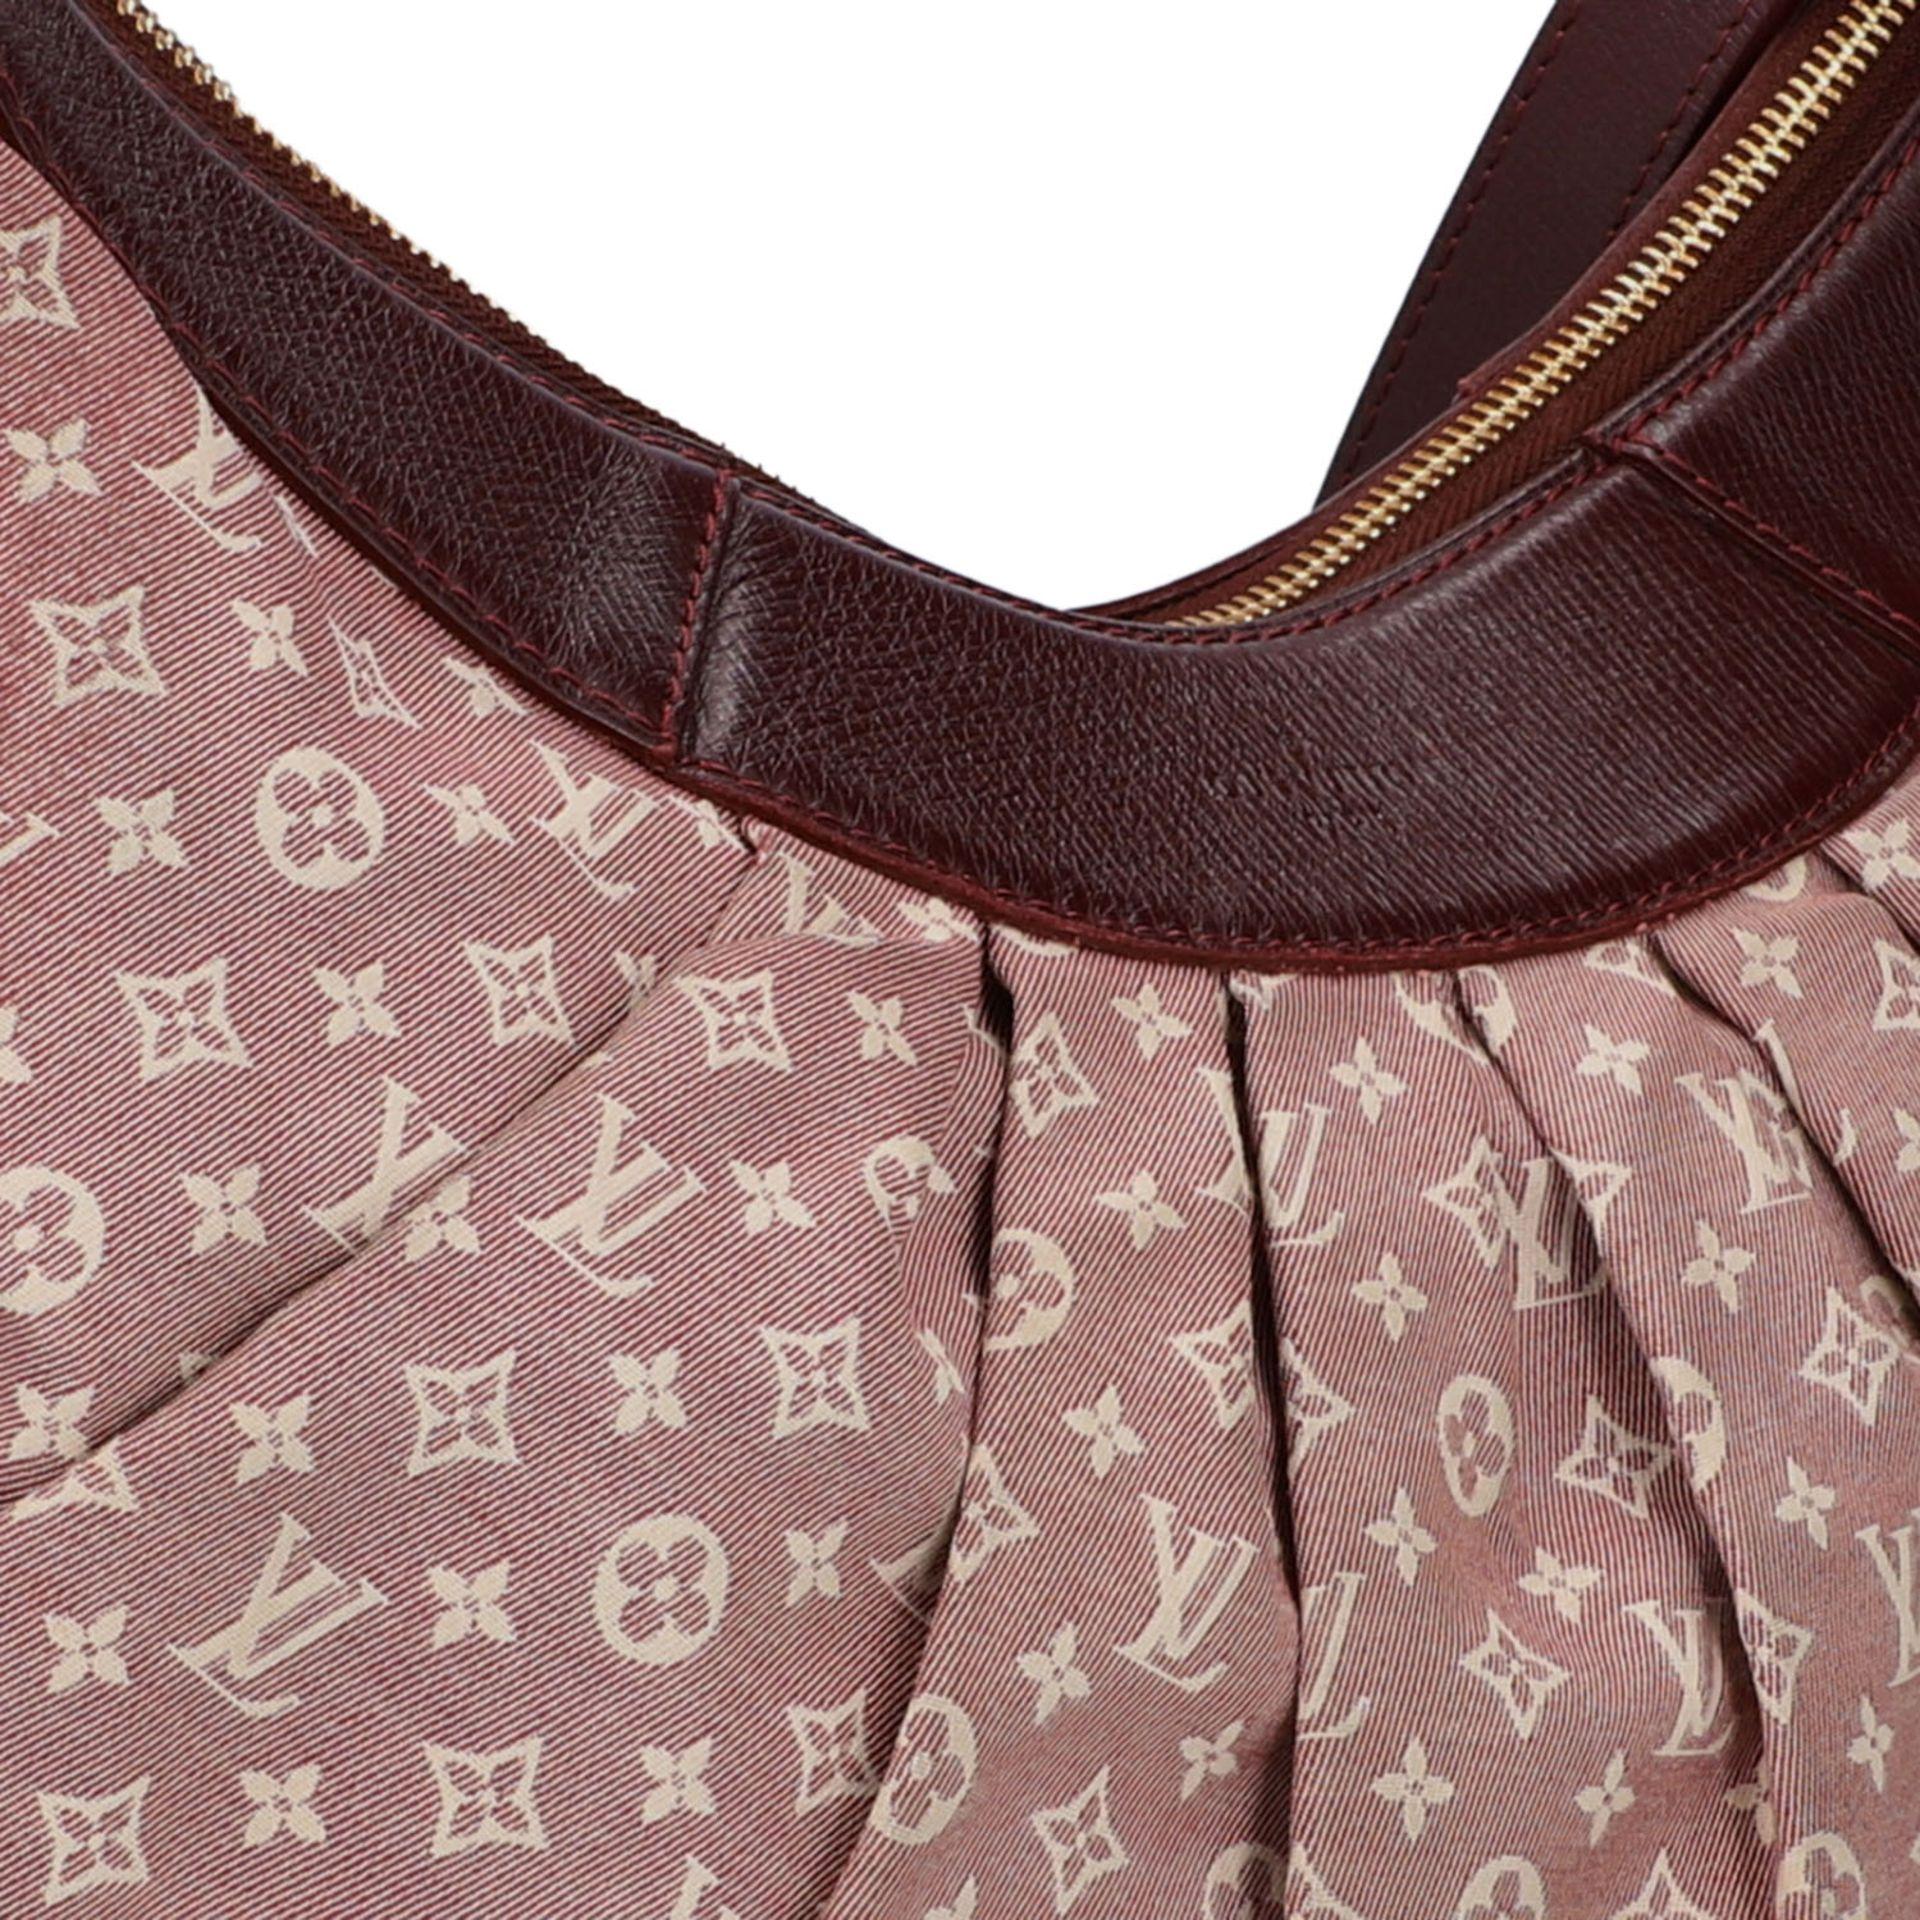 "LOUIS VUITTON Hobobag ""MANON PM"", Koll.: 2010.Mini Lin Serie in Bordeaux, Lederdetails - Image 8 of 8"